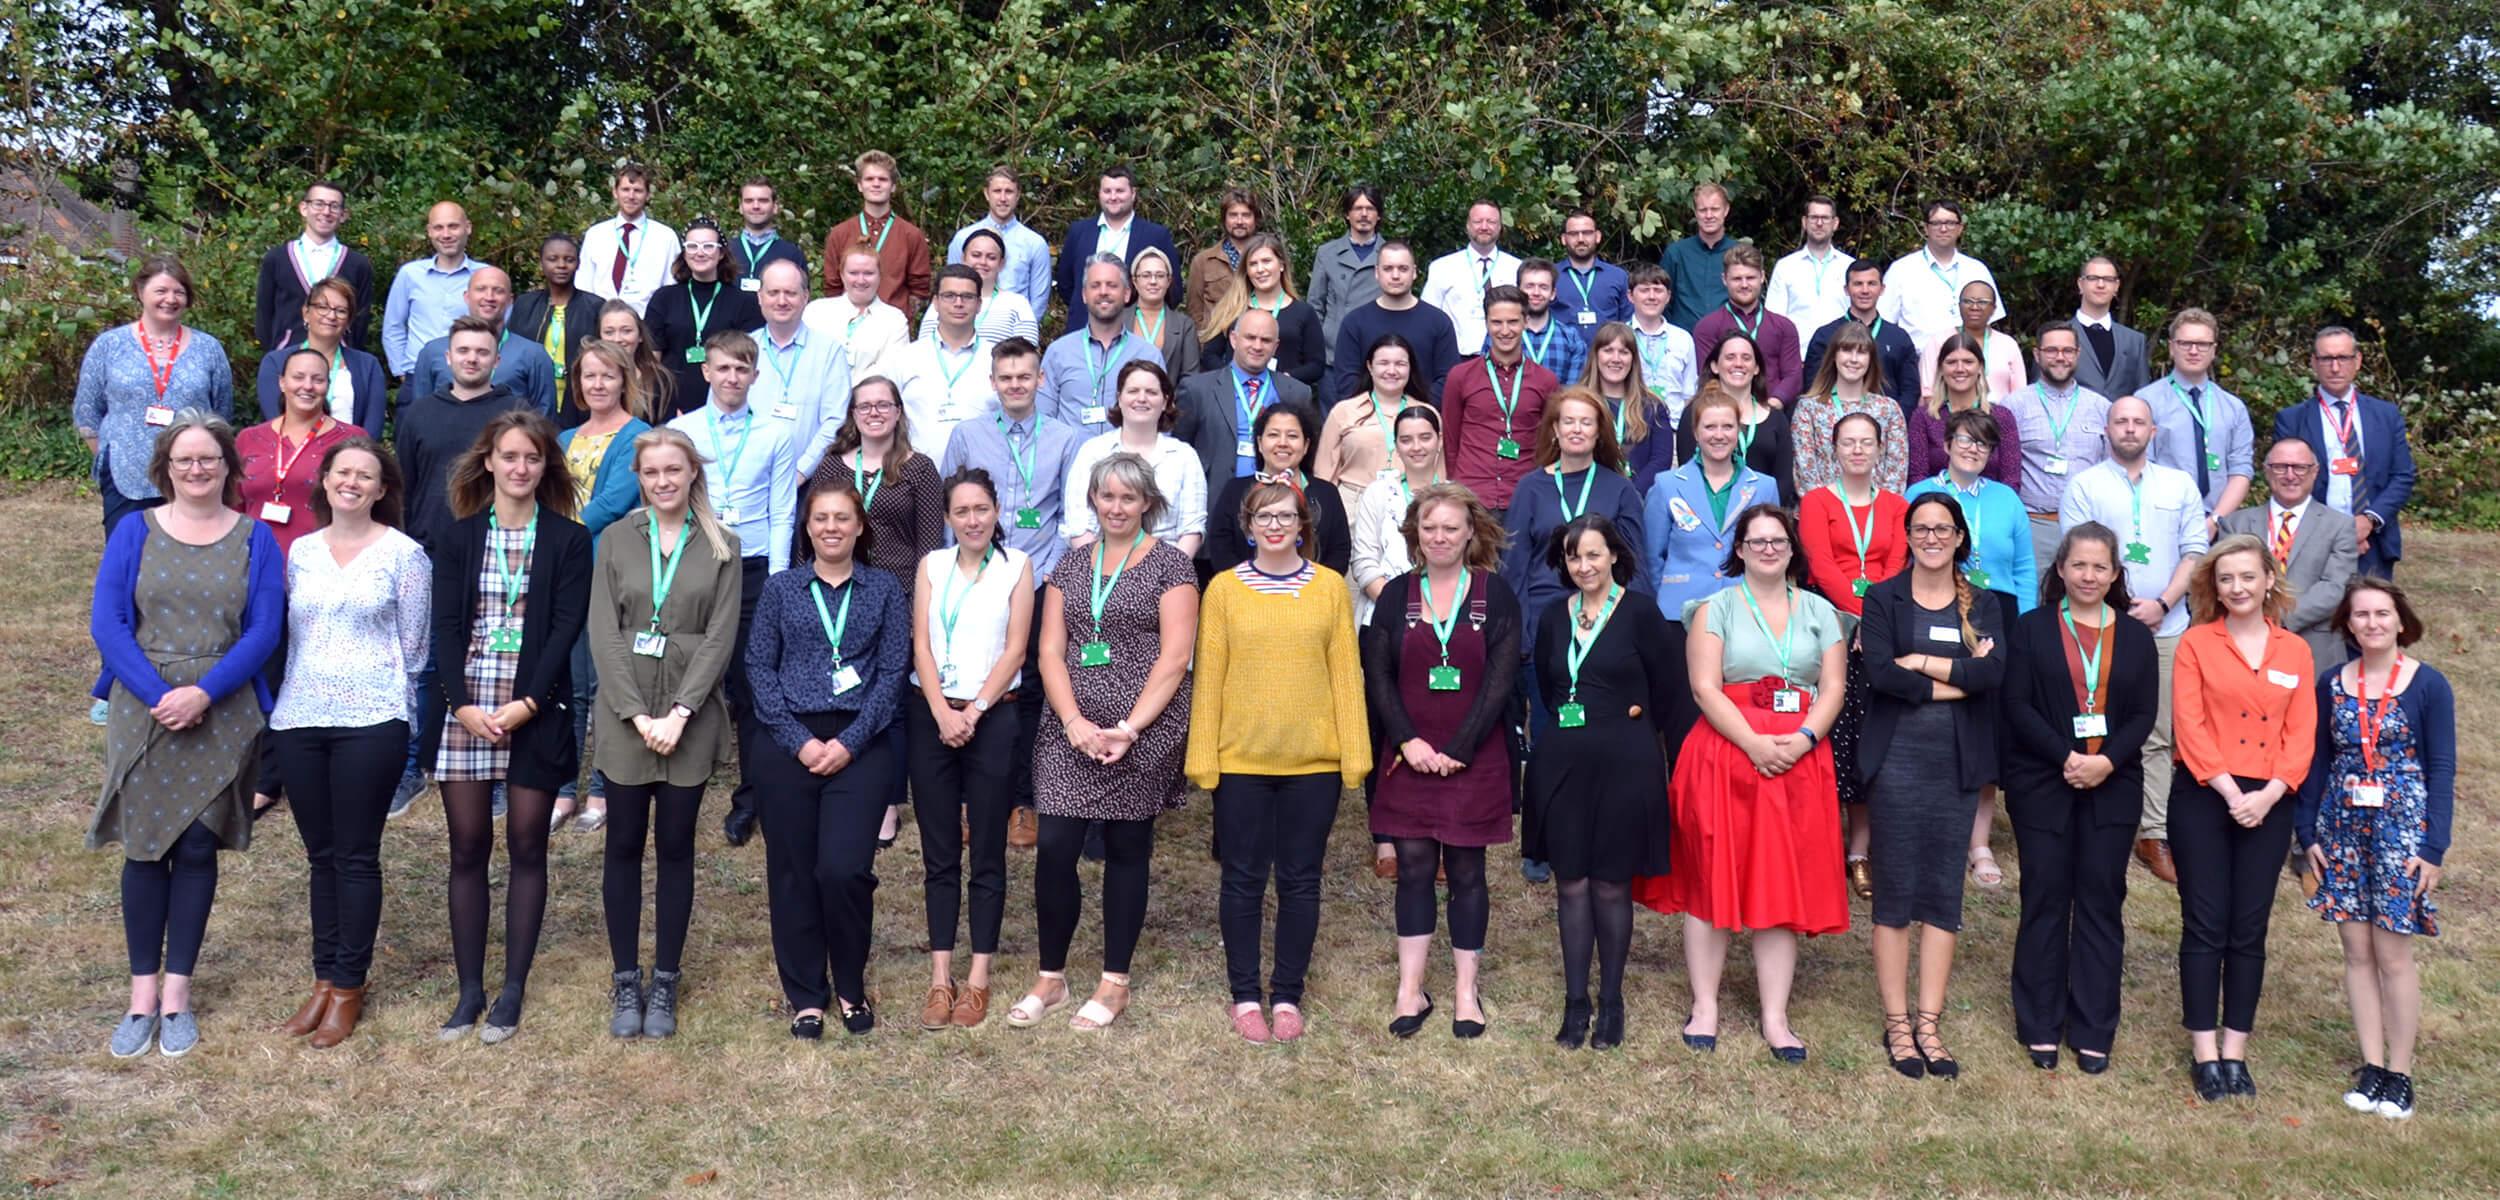 norfolk-teacher-training-centre-welcomes-record-number-of-trainee-teachers.jpg